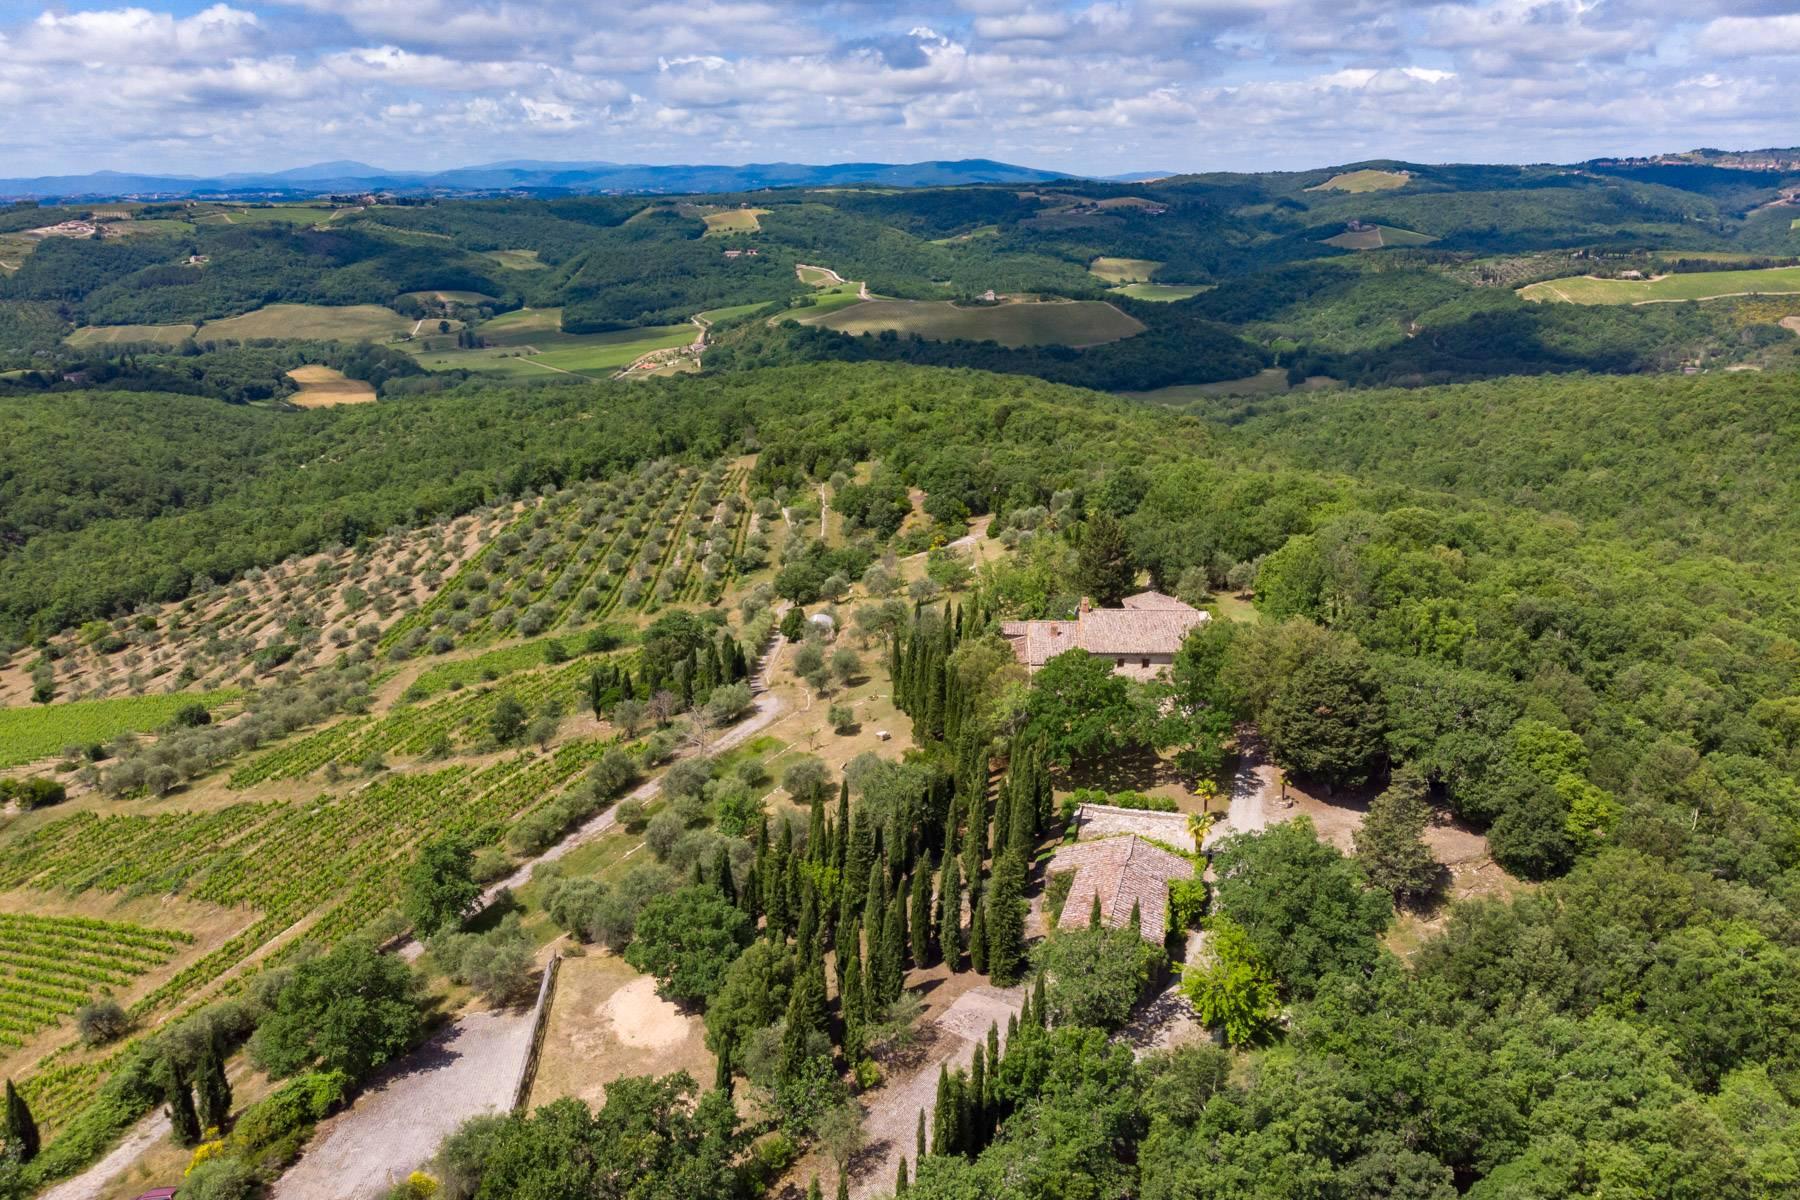 Villa in Vendita a Gaiole In Chianti: 5 locali, 465 mq - Foto 10